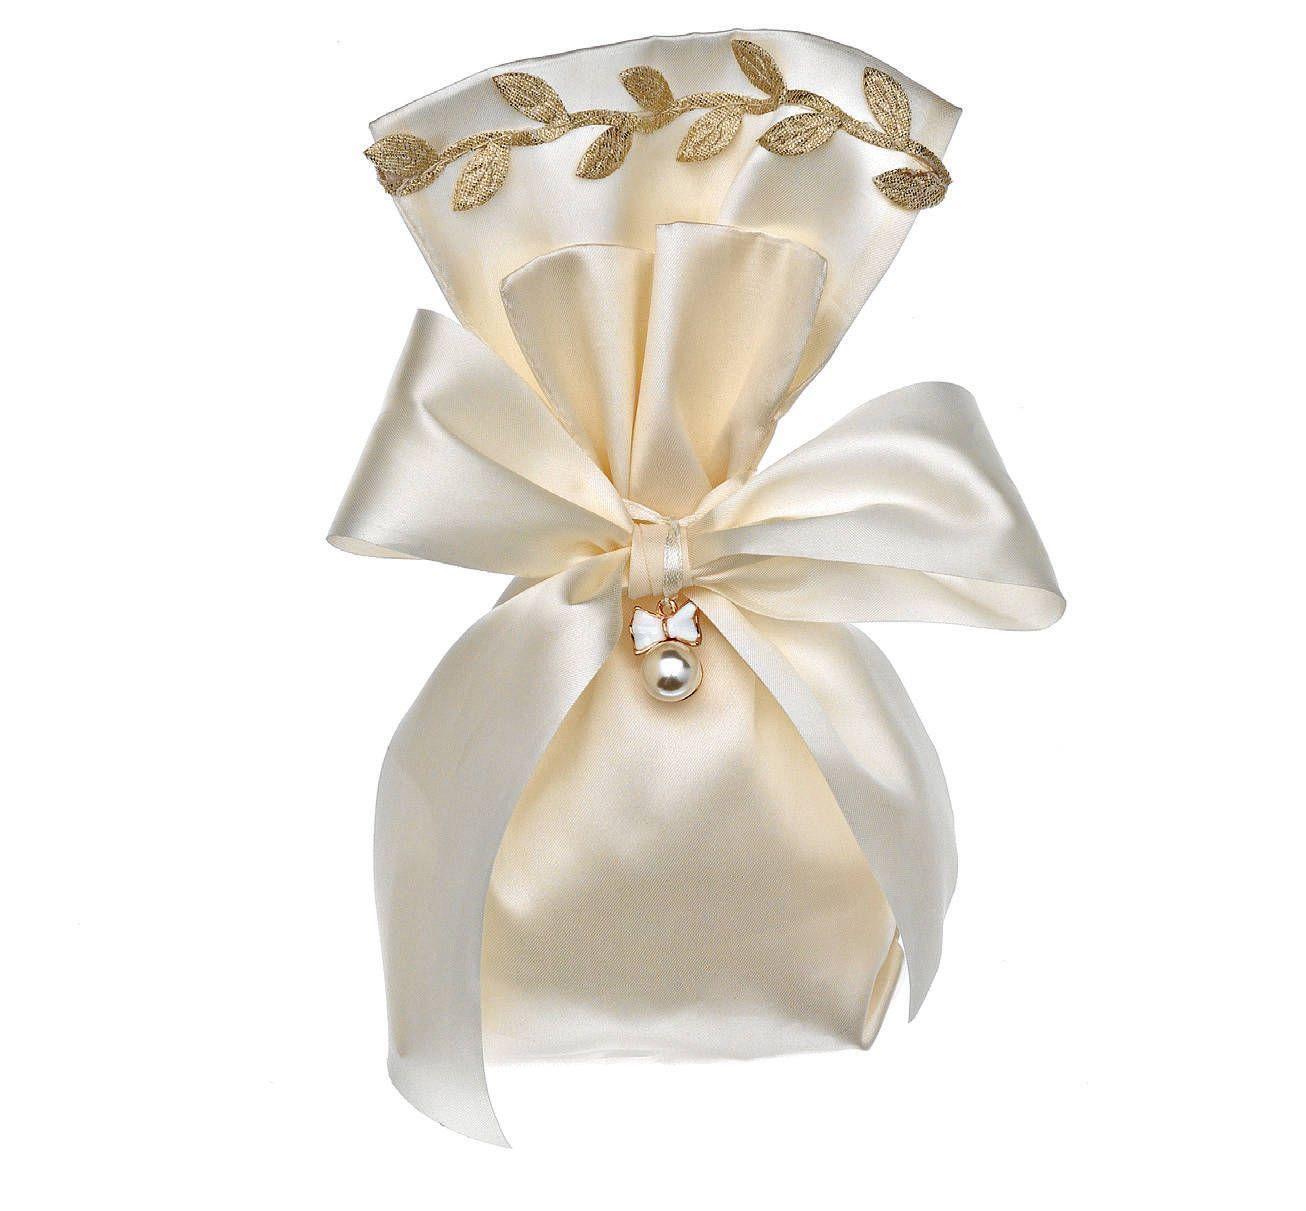 Olive pearl favors unique favors wedding favors Baptism favors Greek ...